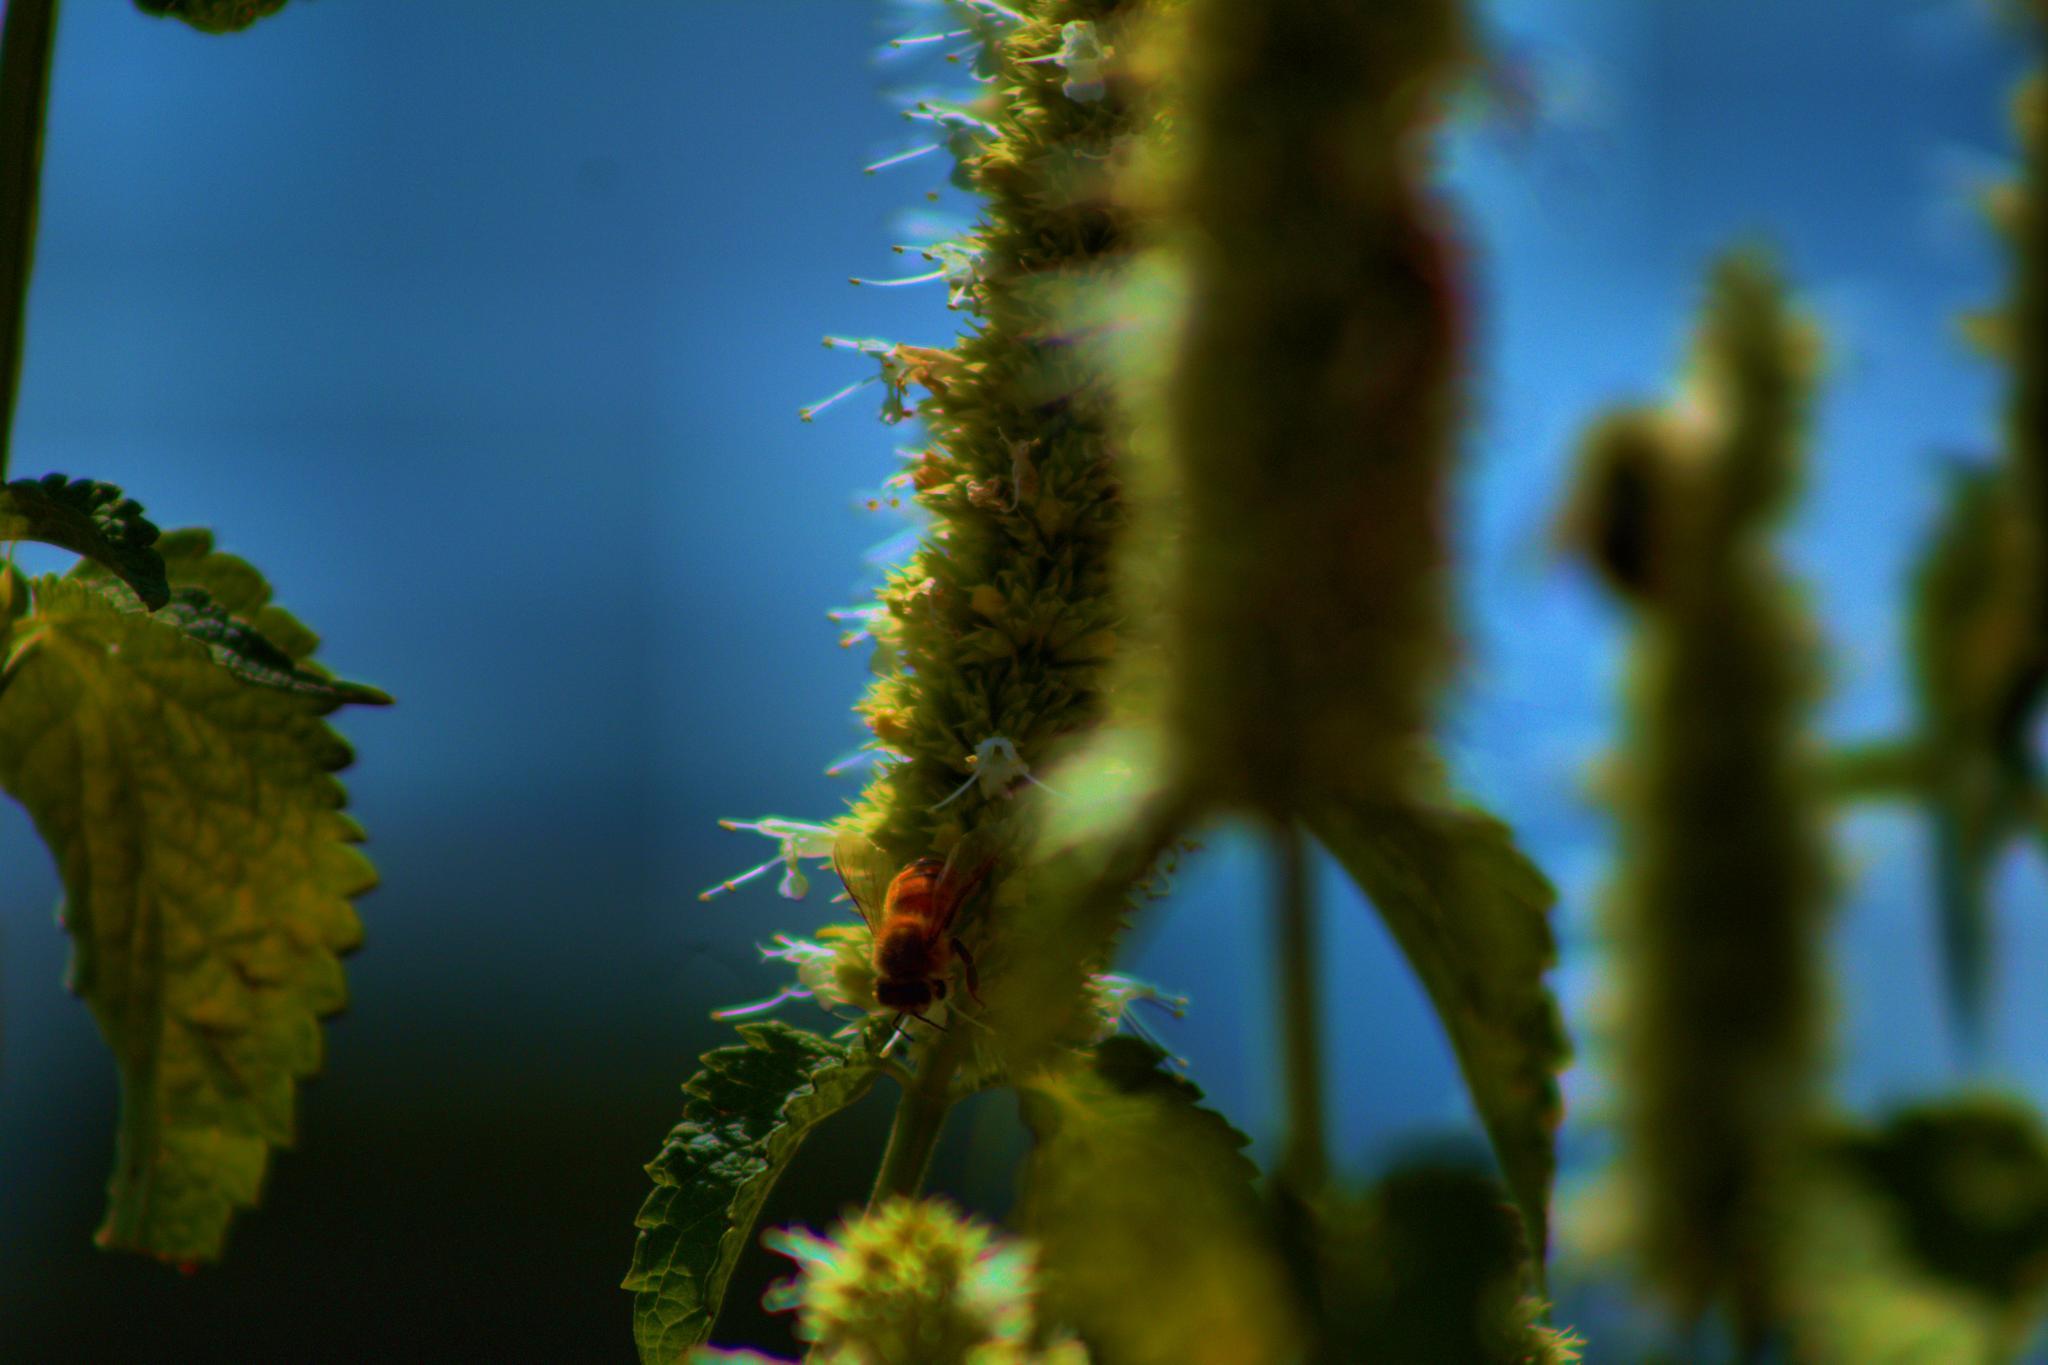 a bees life by Lisa Kelley